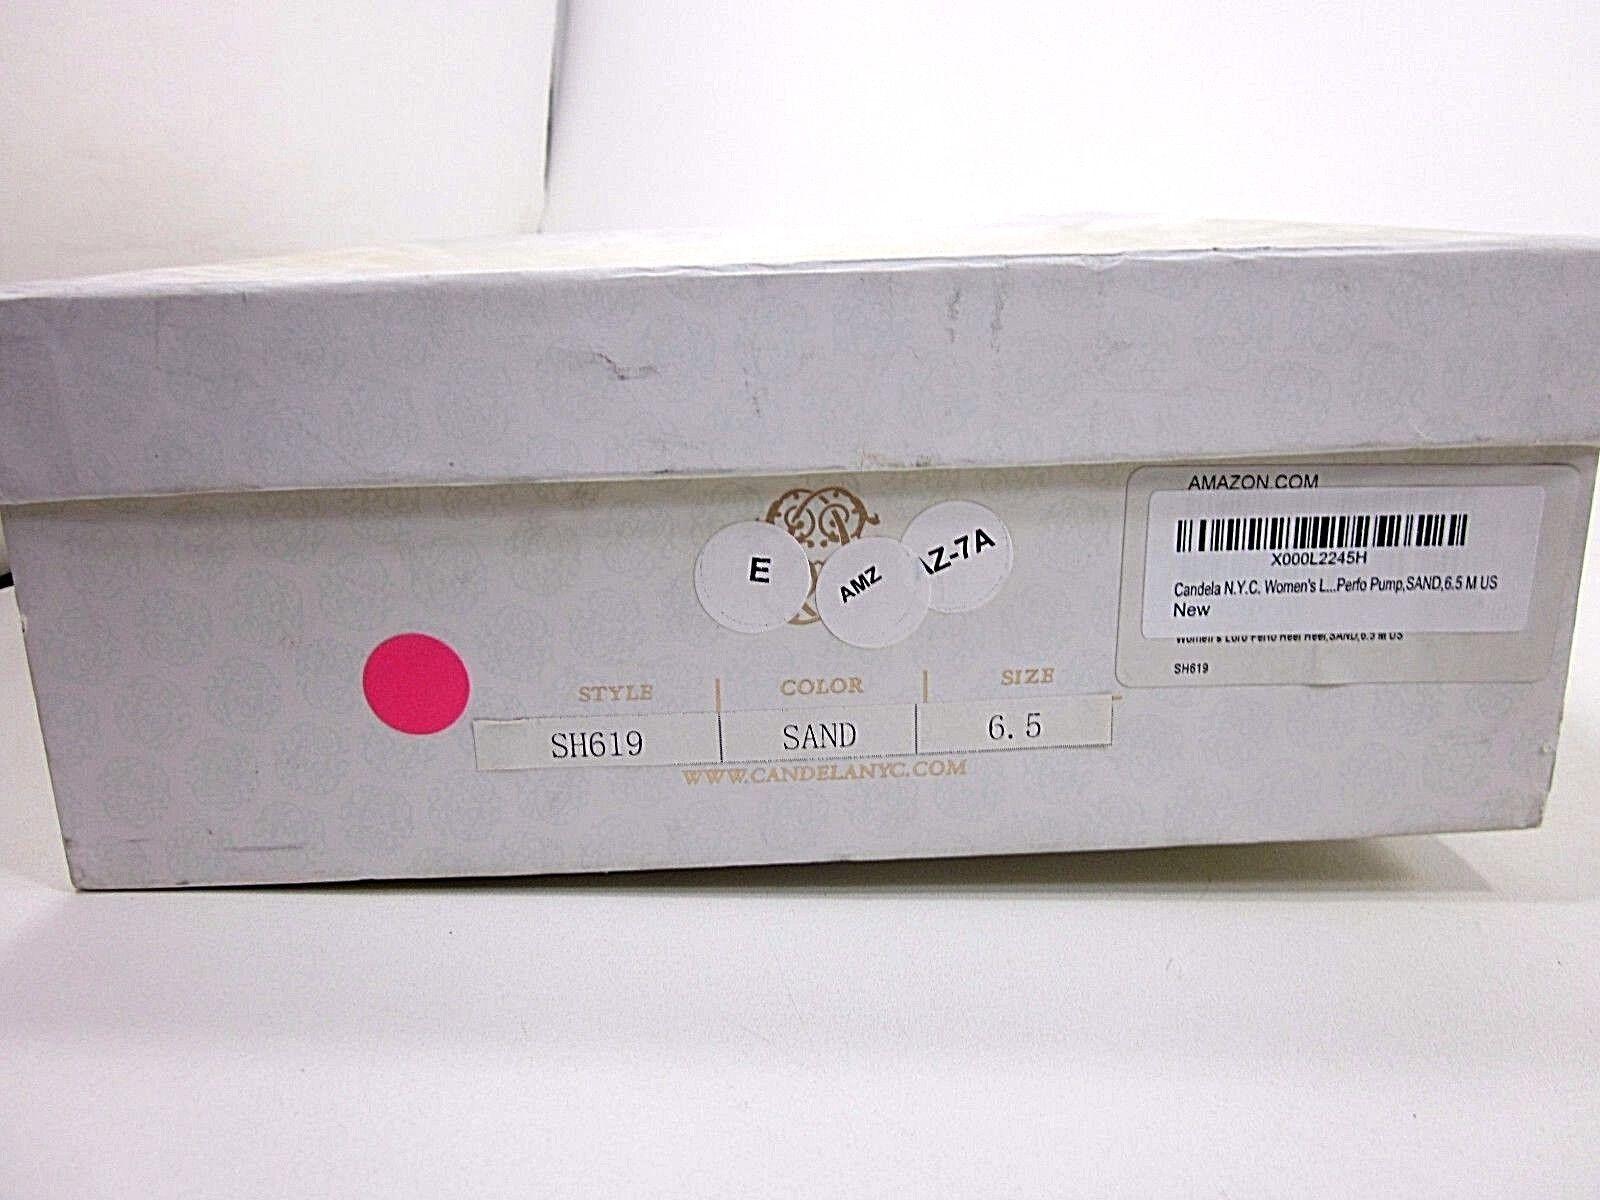 CANDELA N.Y.C, LORO PERFO PUMP, Damenschuhe, M, SAND, US SIZE 6.5 M, Damenschuhe, NEW WITH BOX 6b78c0